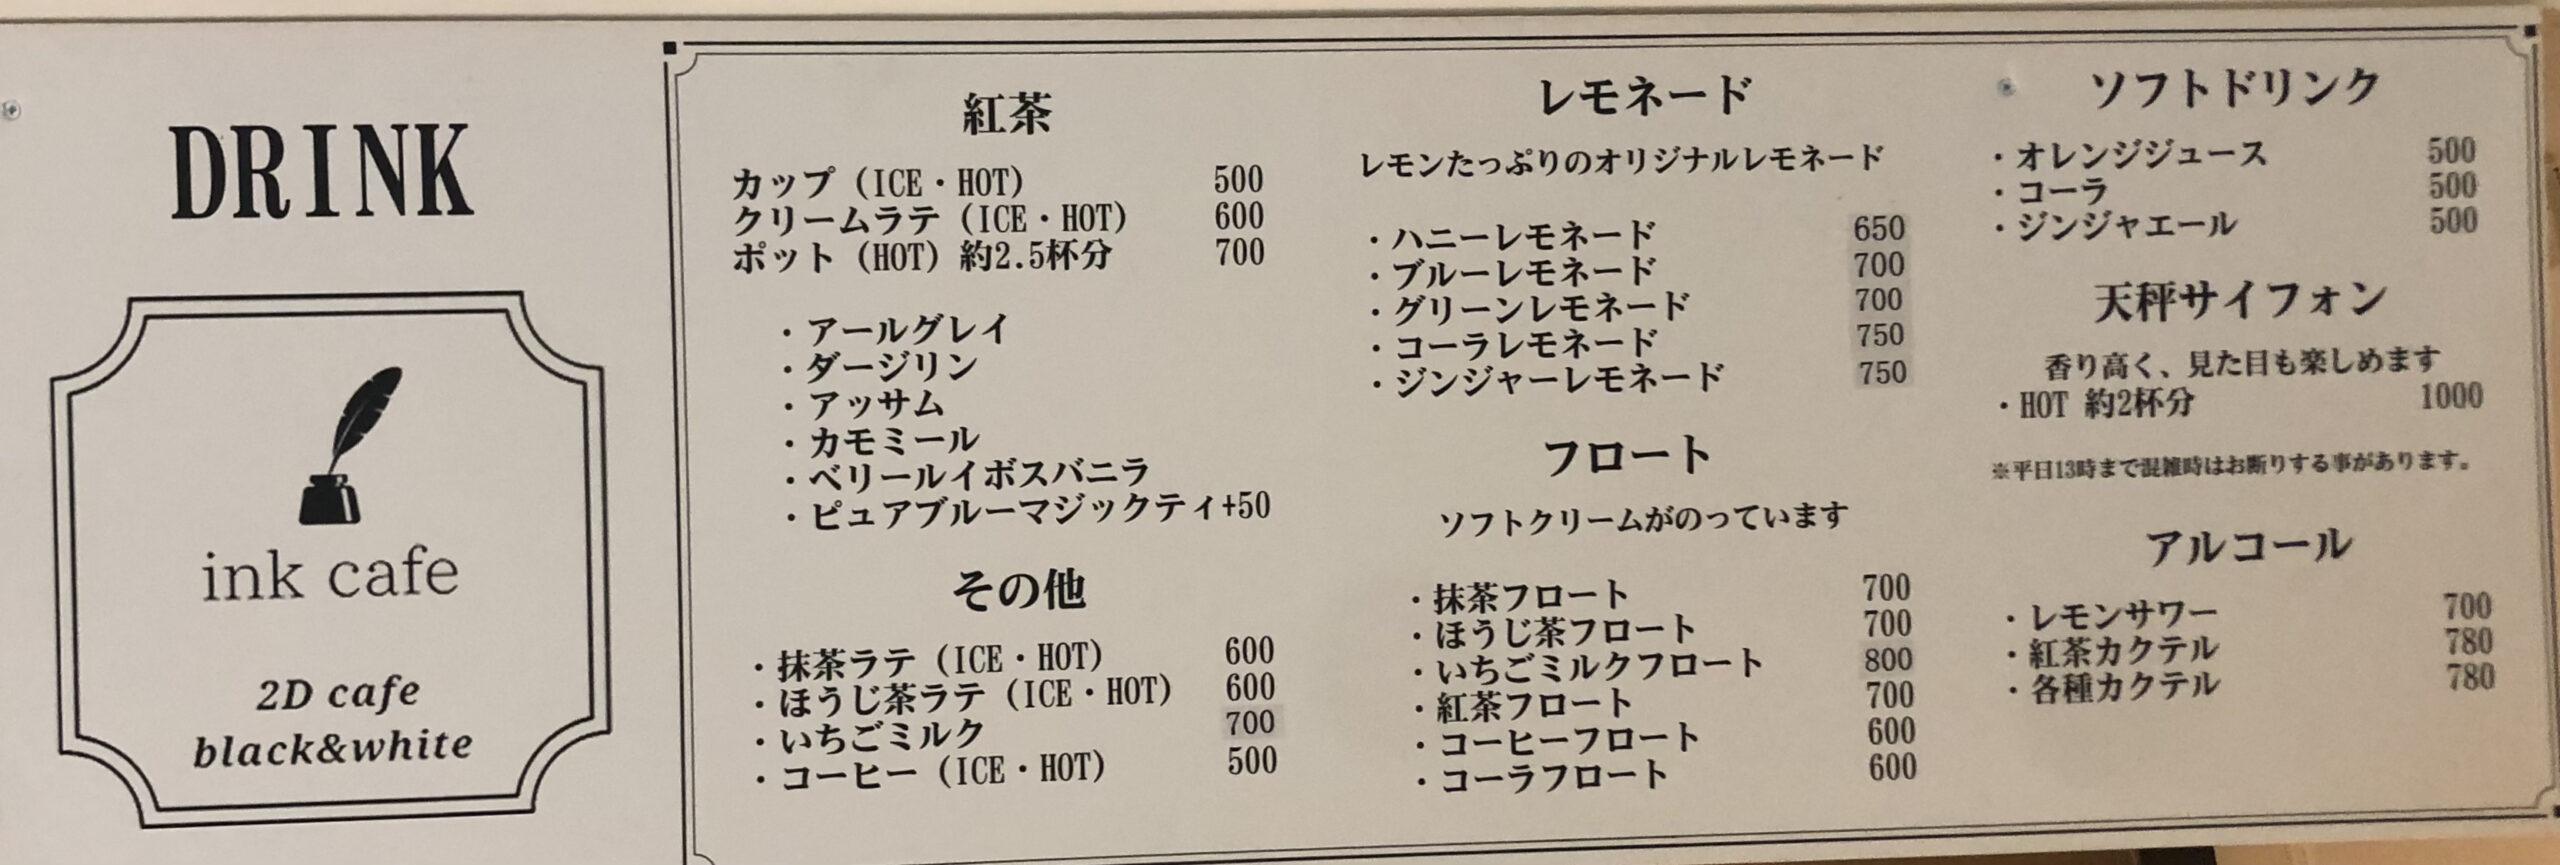 inkcafe メニュー 内観 場所 画像